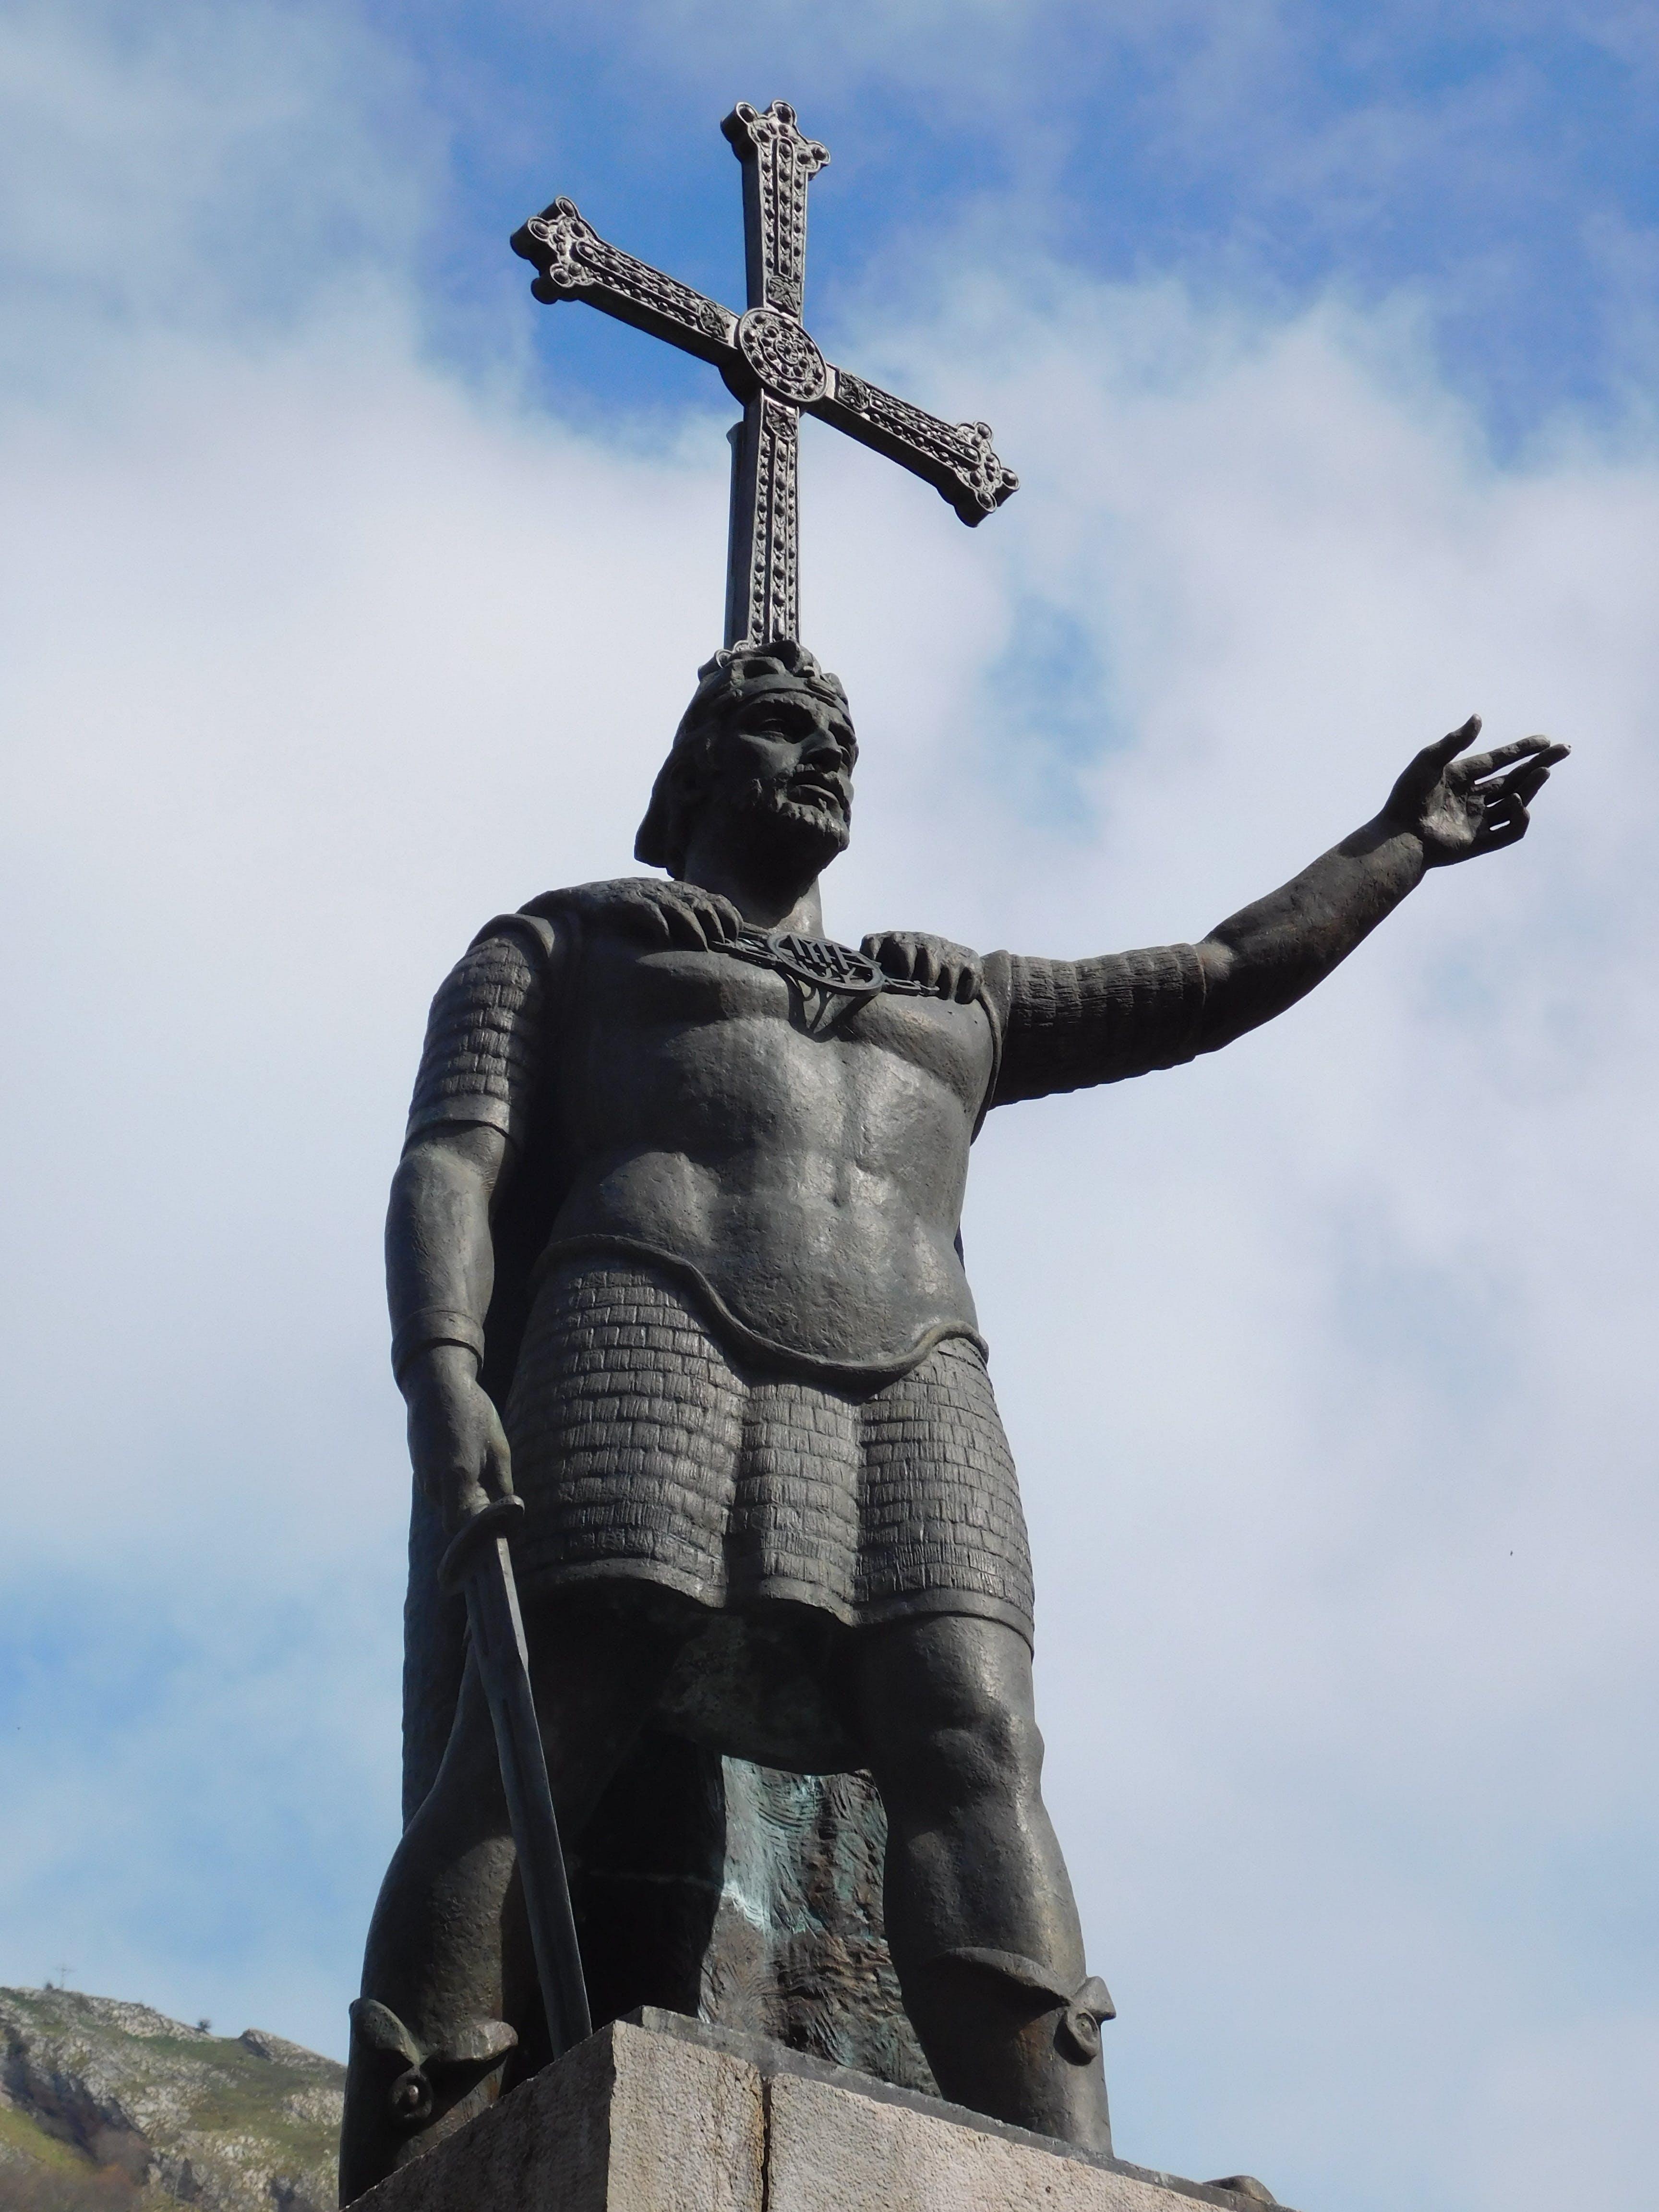 Free stock photo of man, landmark, architecture, statue